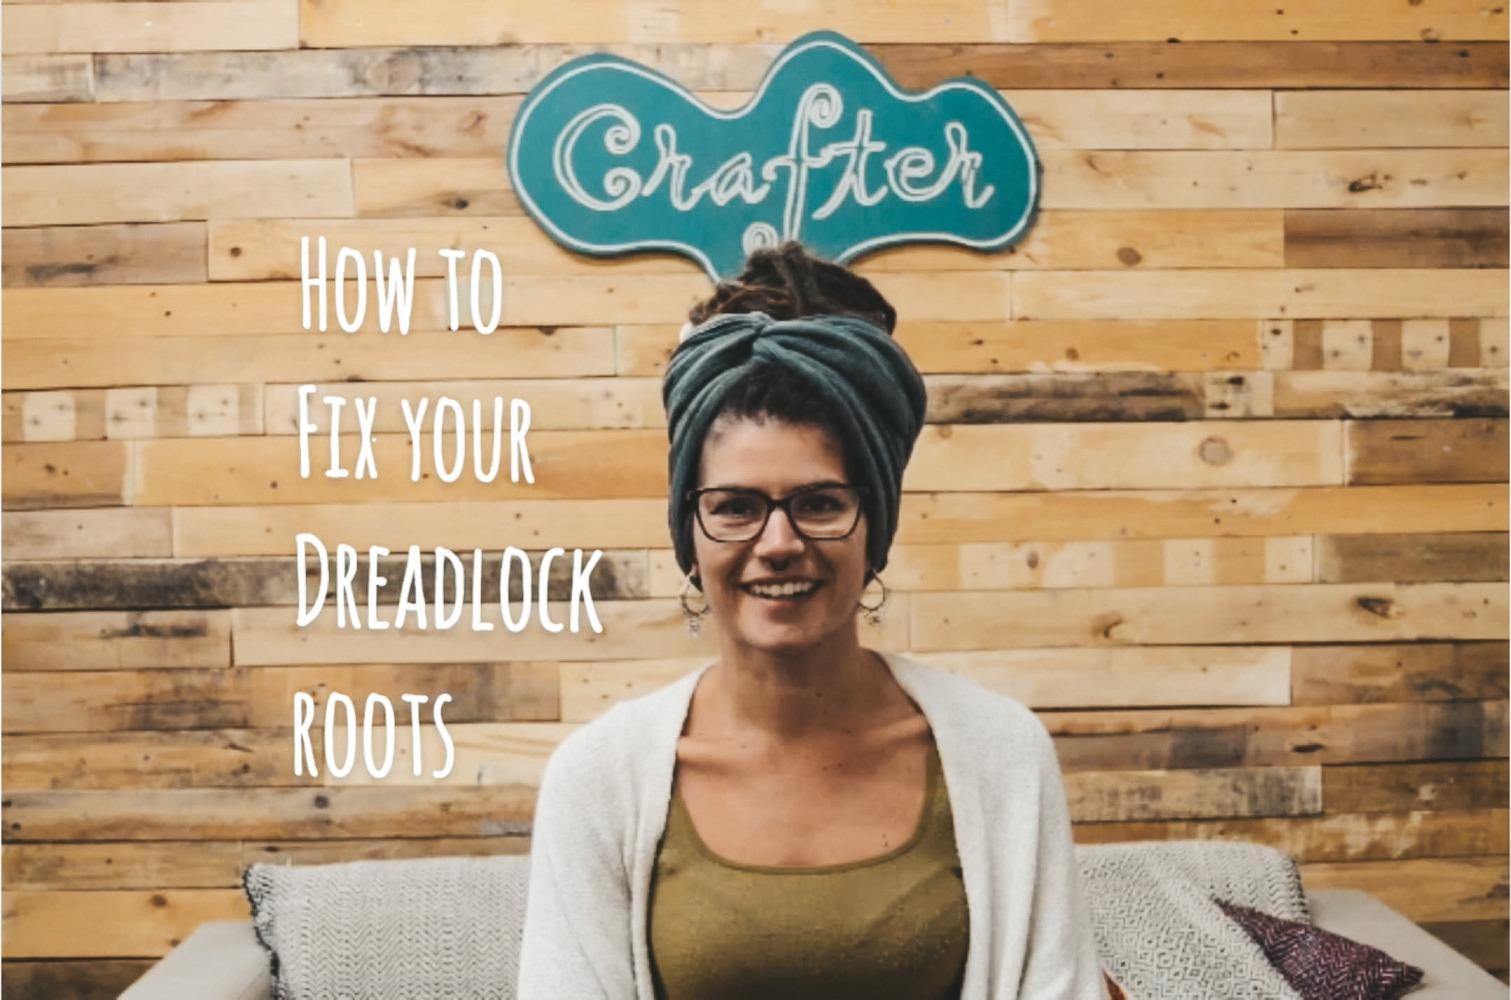 How to Fix your Dreadlock Roots – Video Tutorial